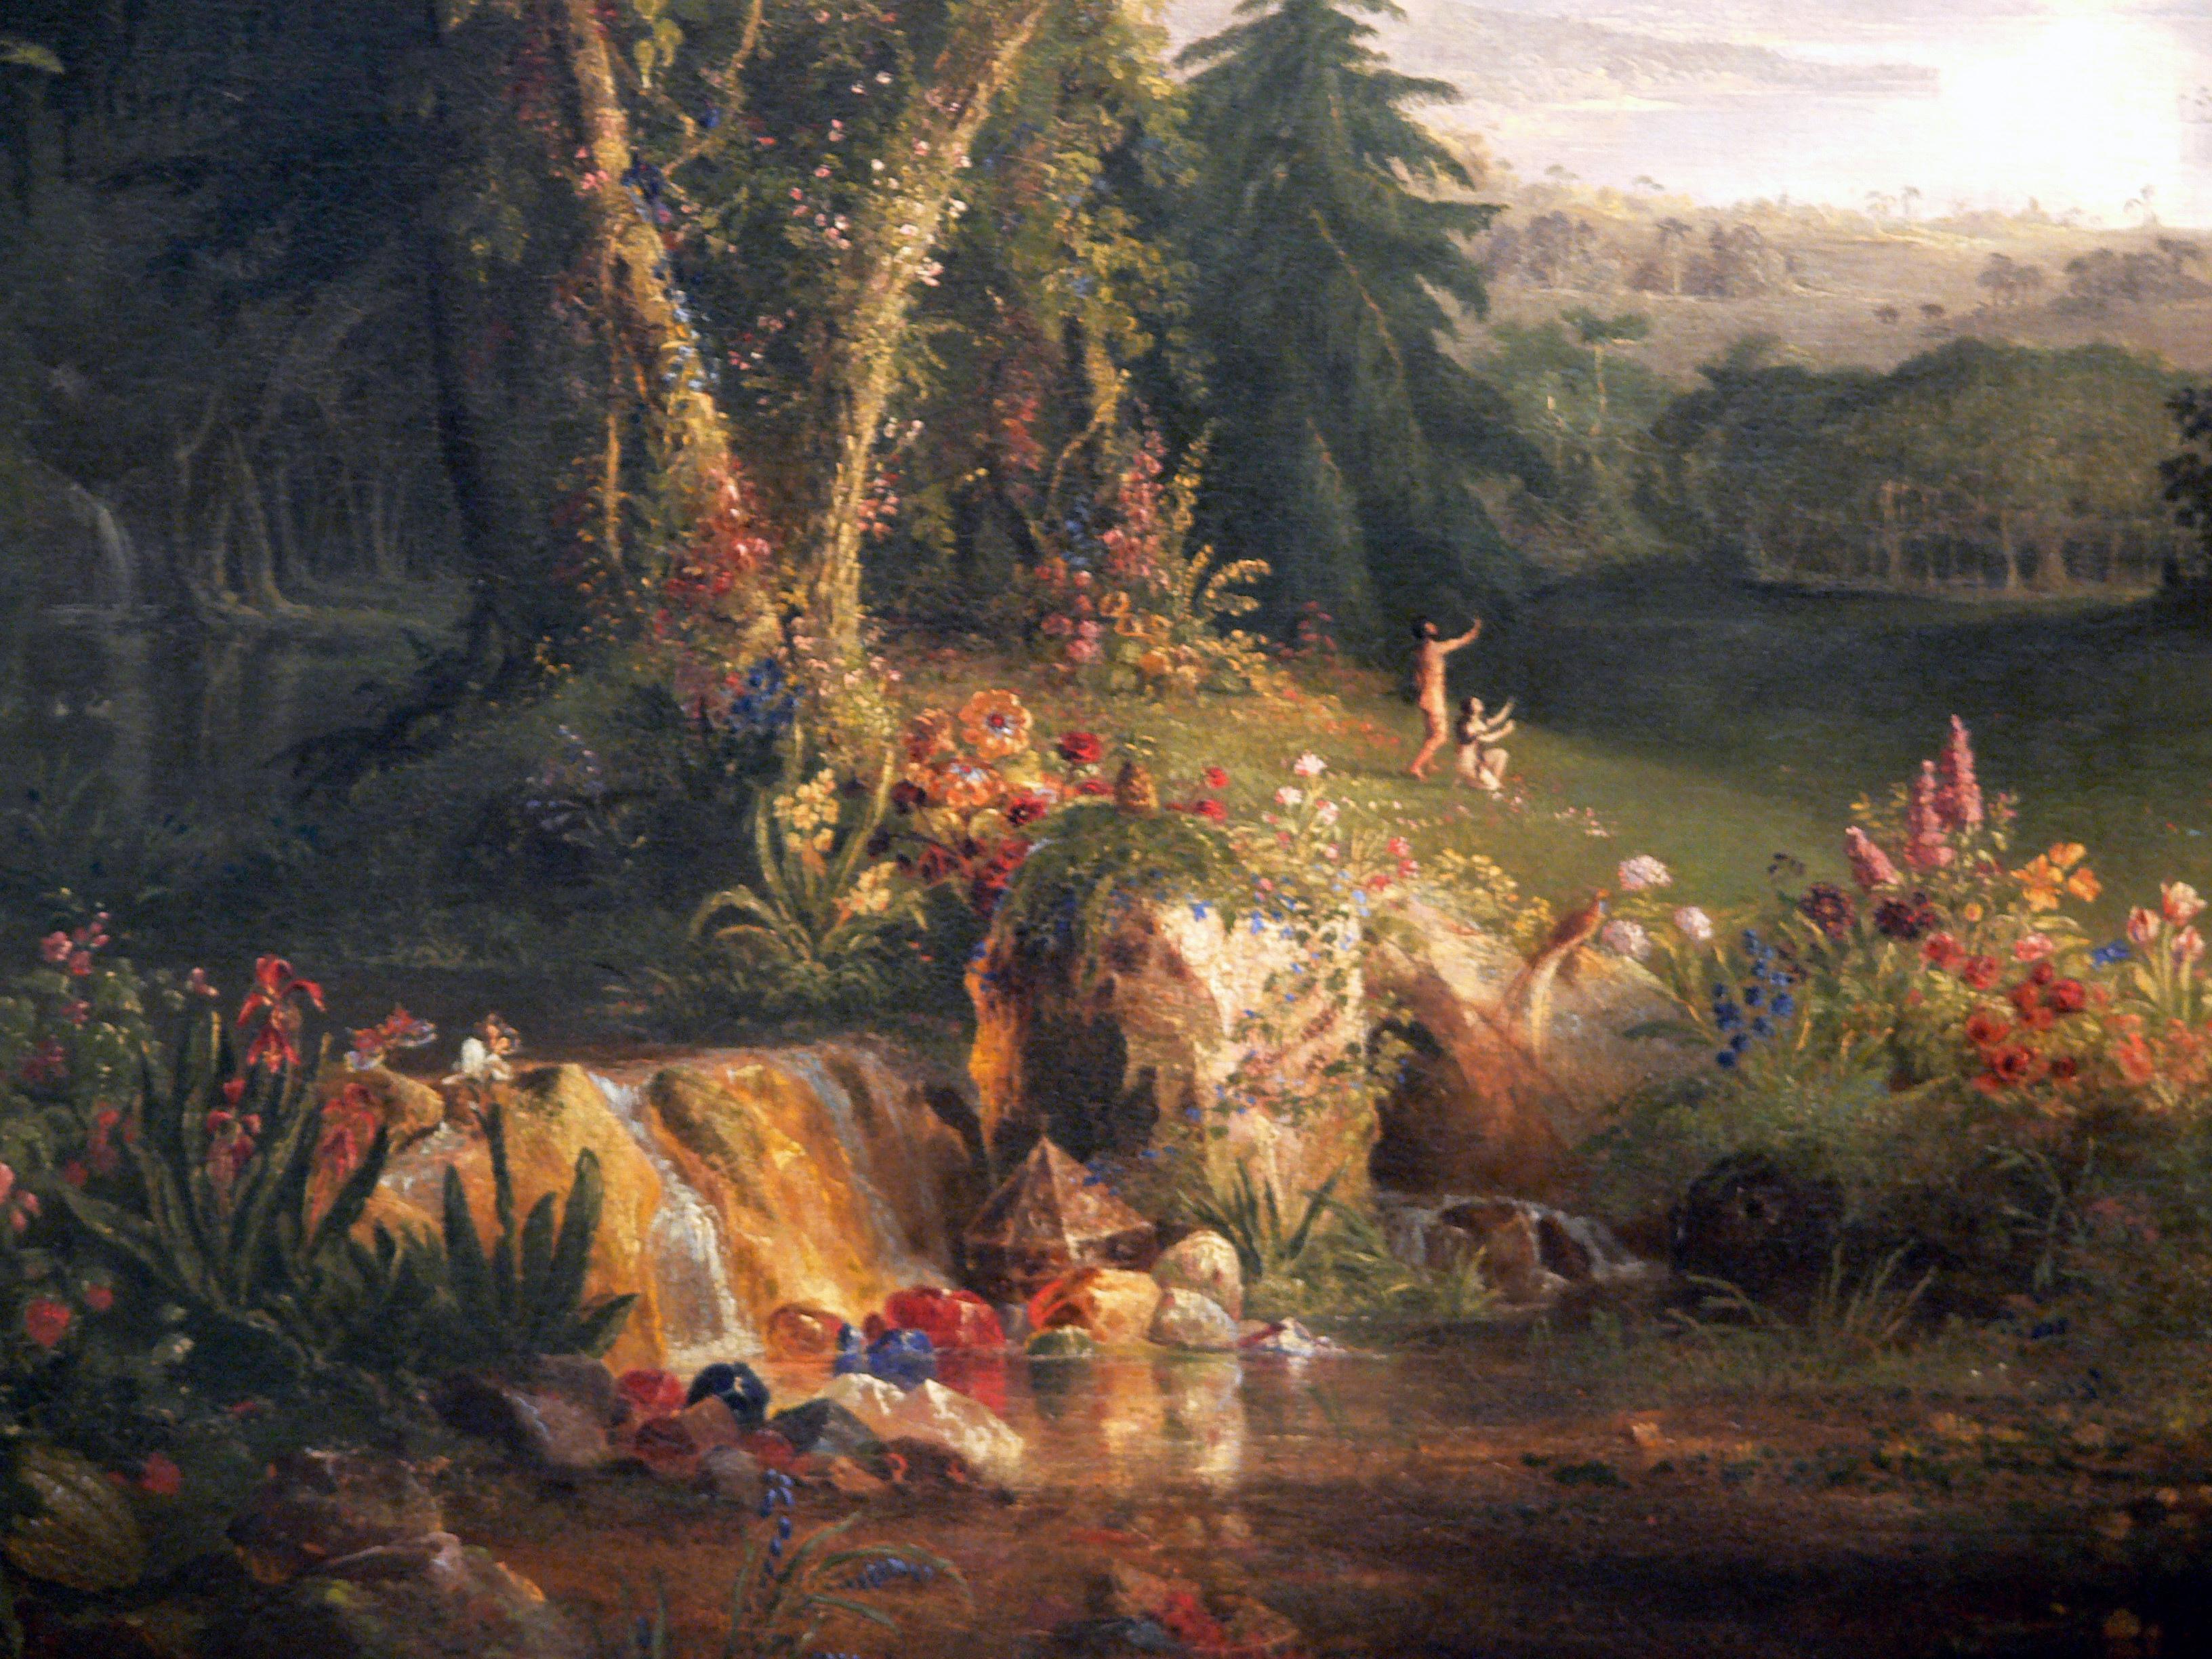 file thomas cole the garden of eden detail amon carter wikimedia commons